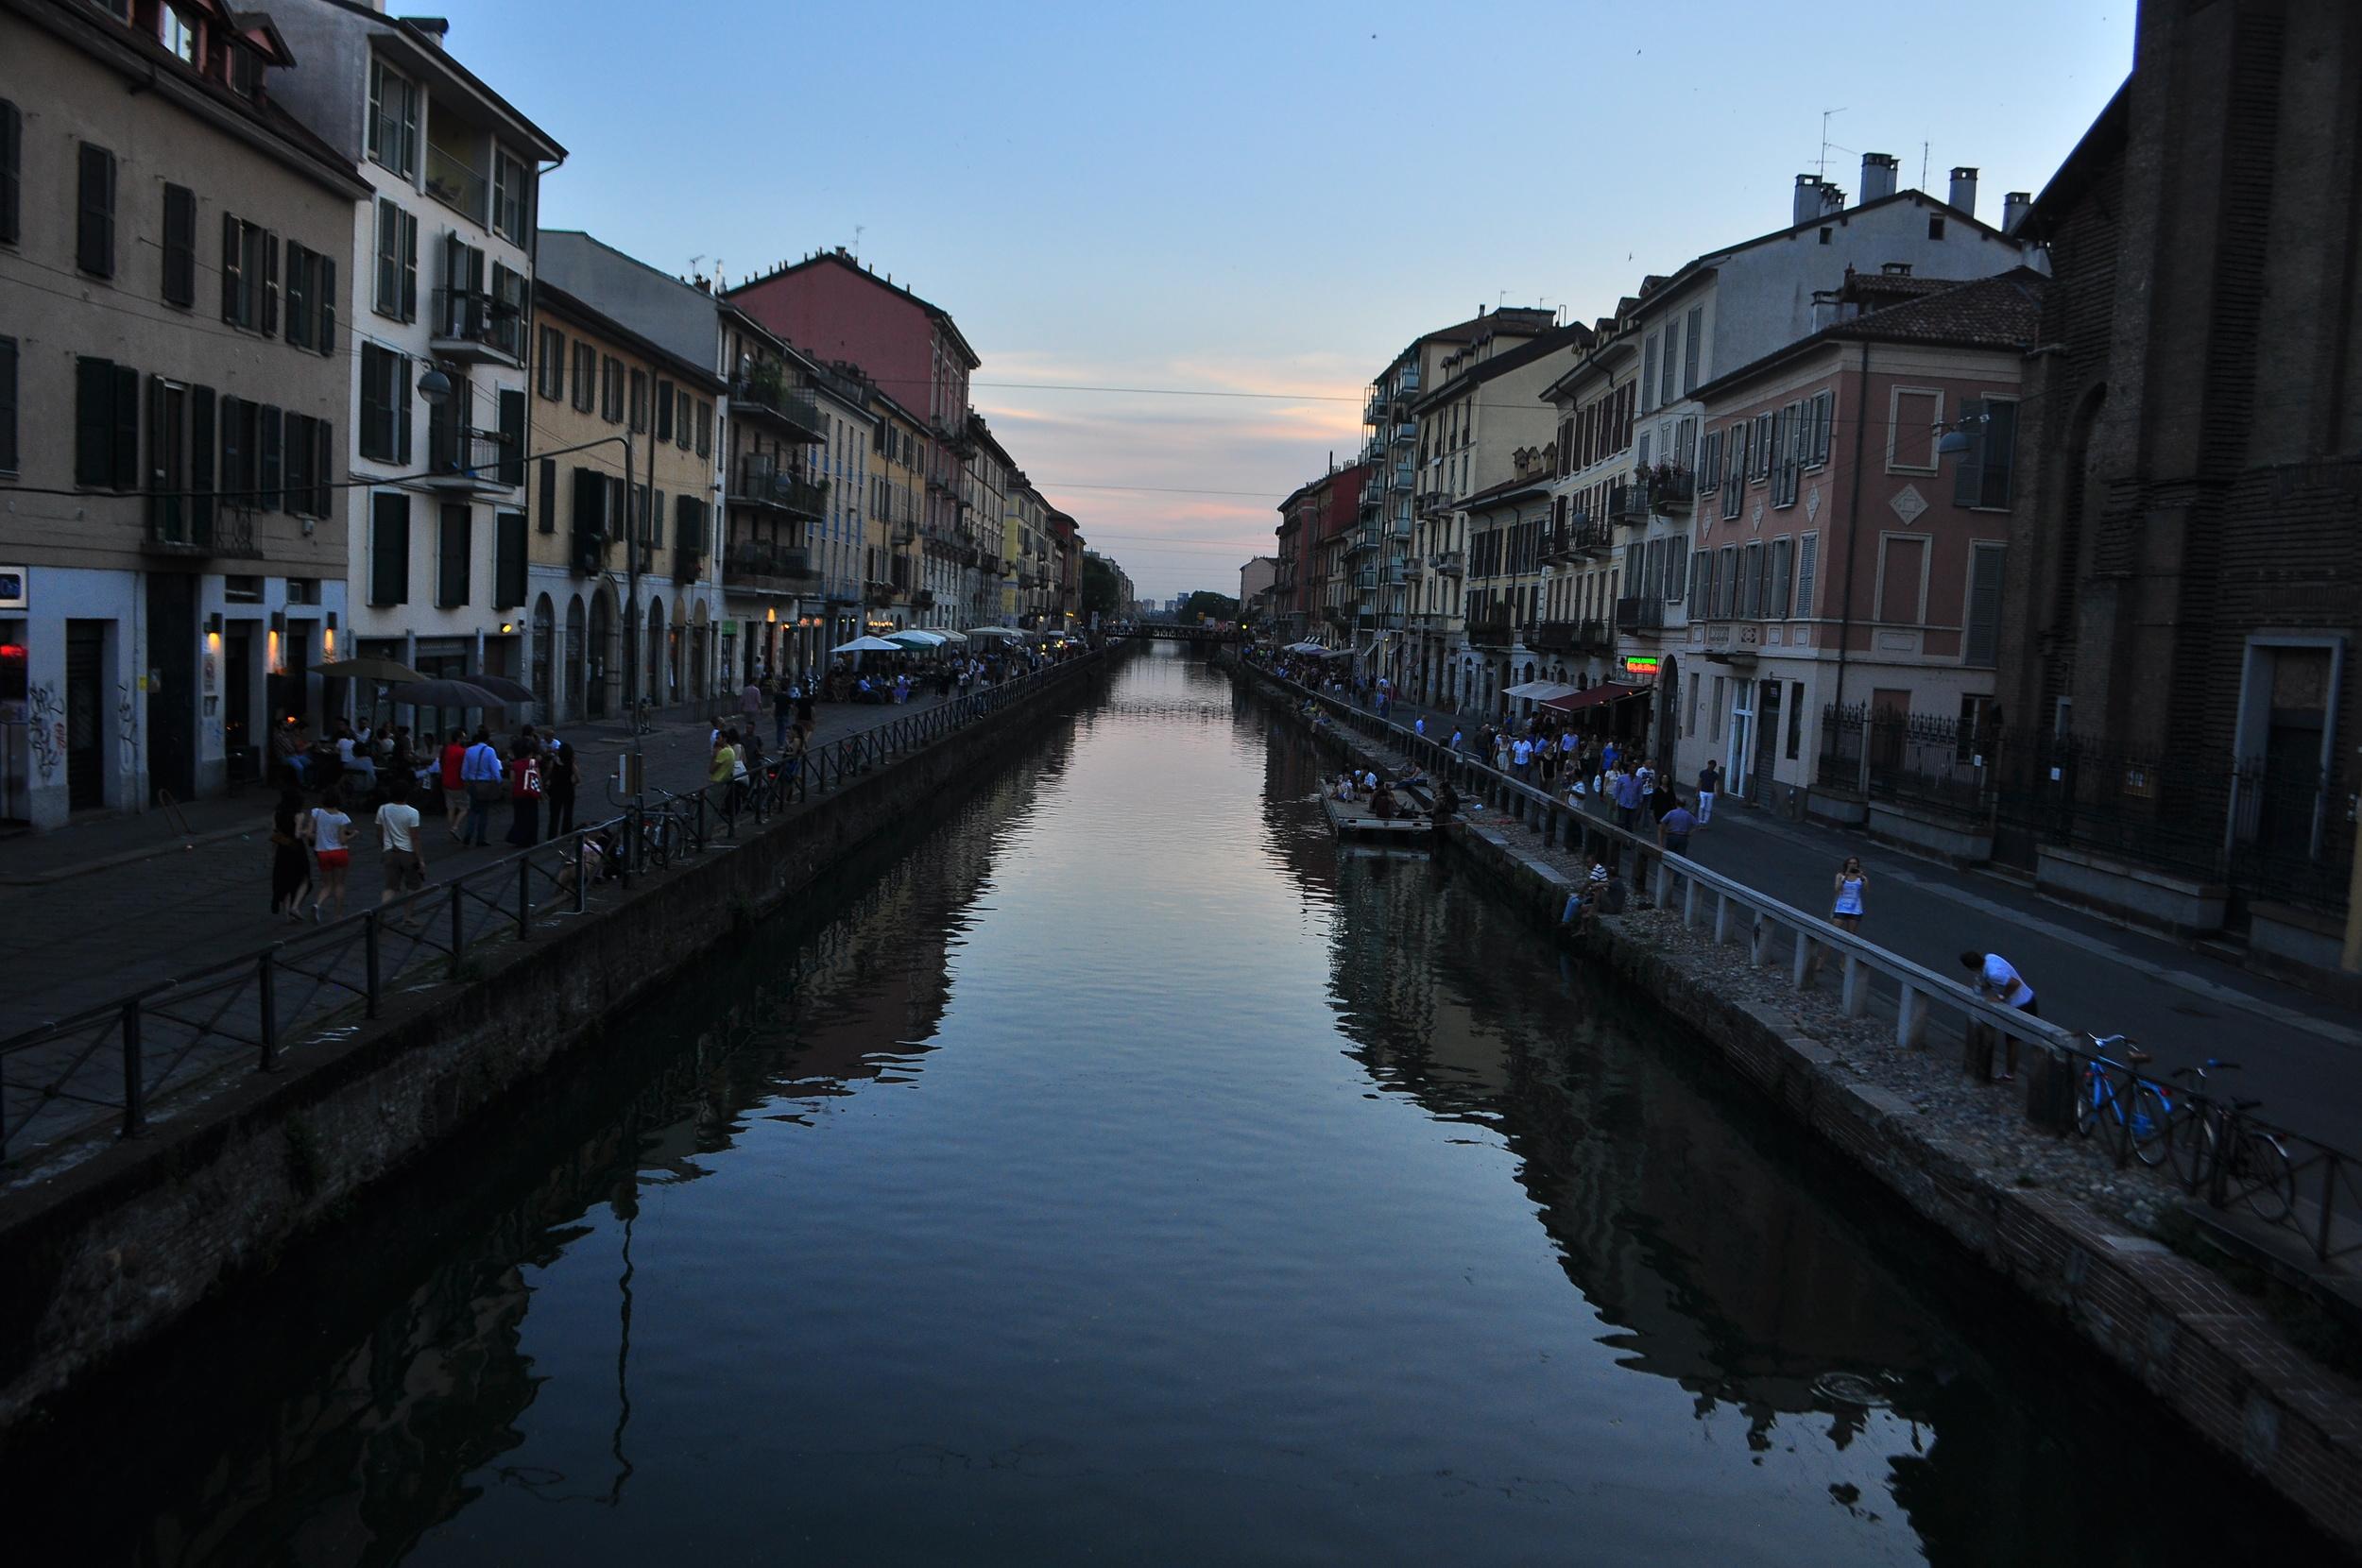 Everyone seemed to enjoy al fresco dining along the canal.